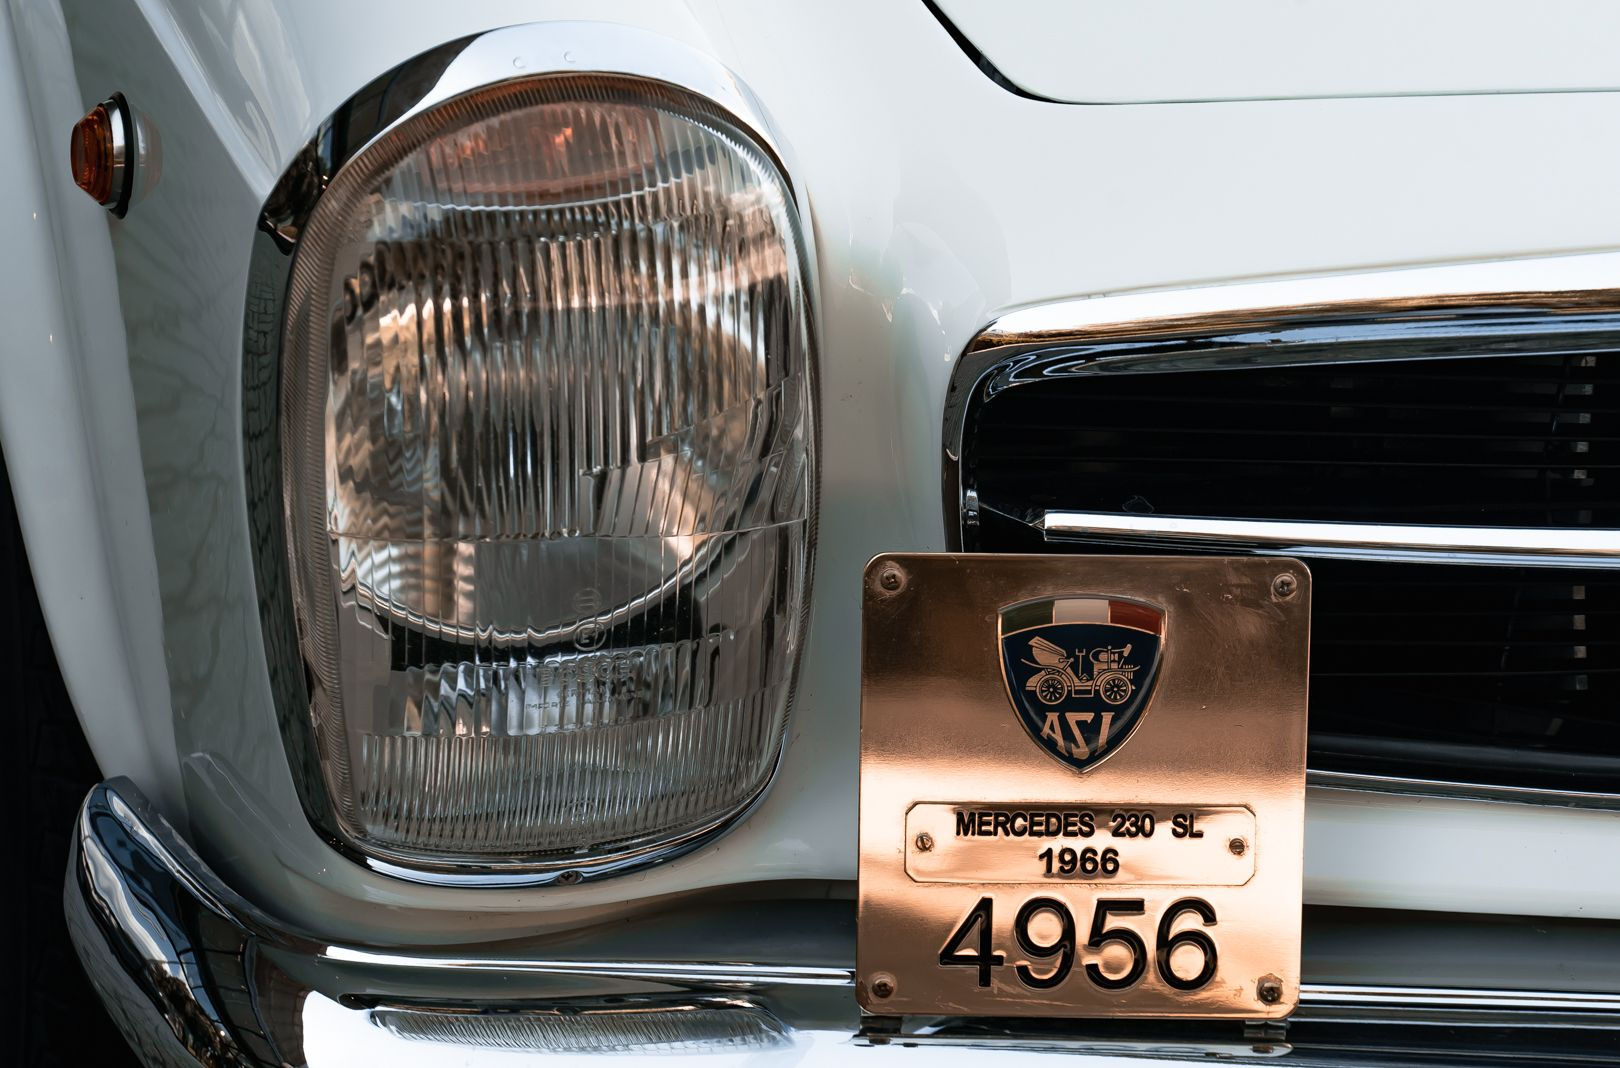 1966 Mercedes Benz SL230 Pagoda 75860